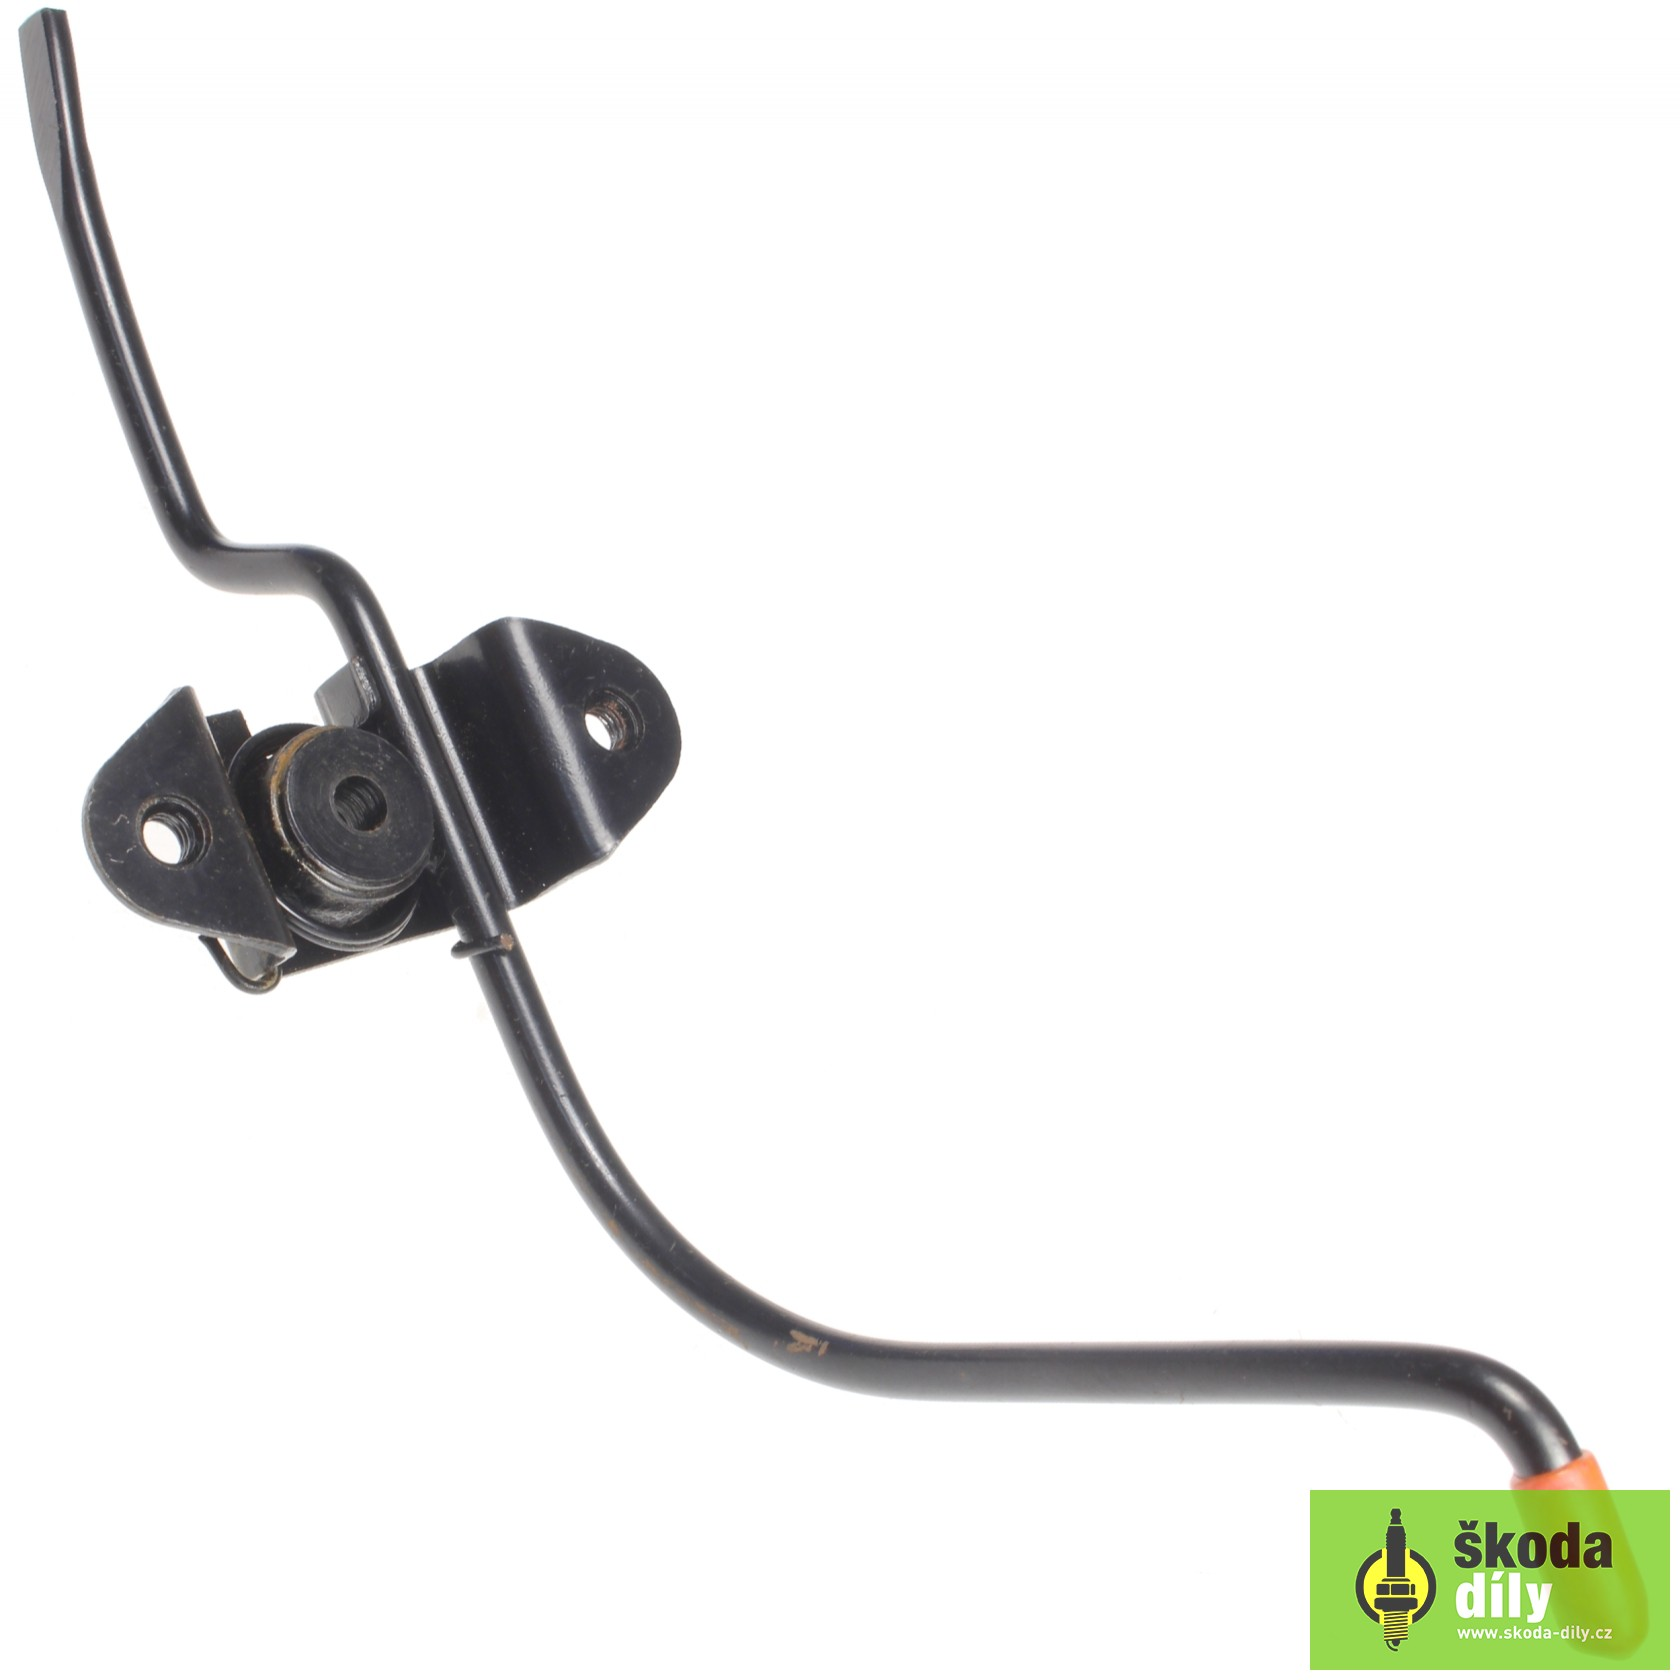 Bonnet Control Lever China 1U0823457D